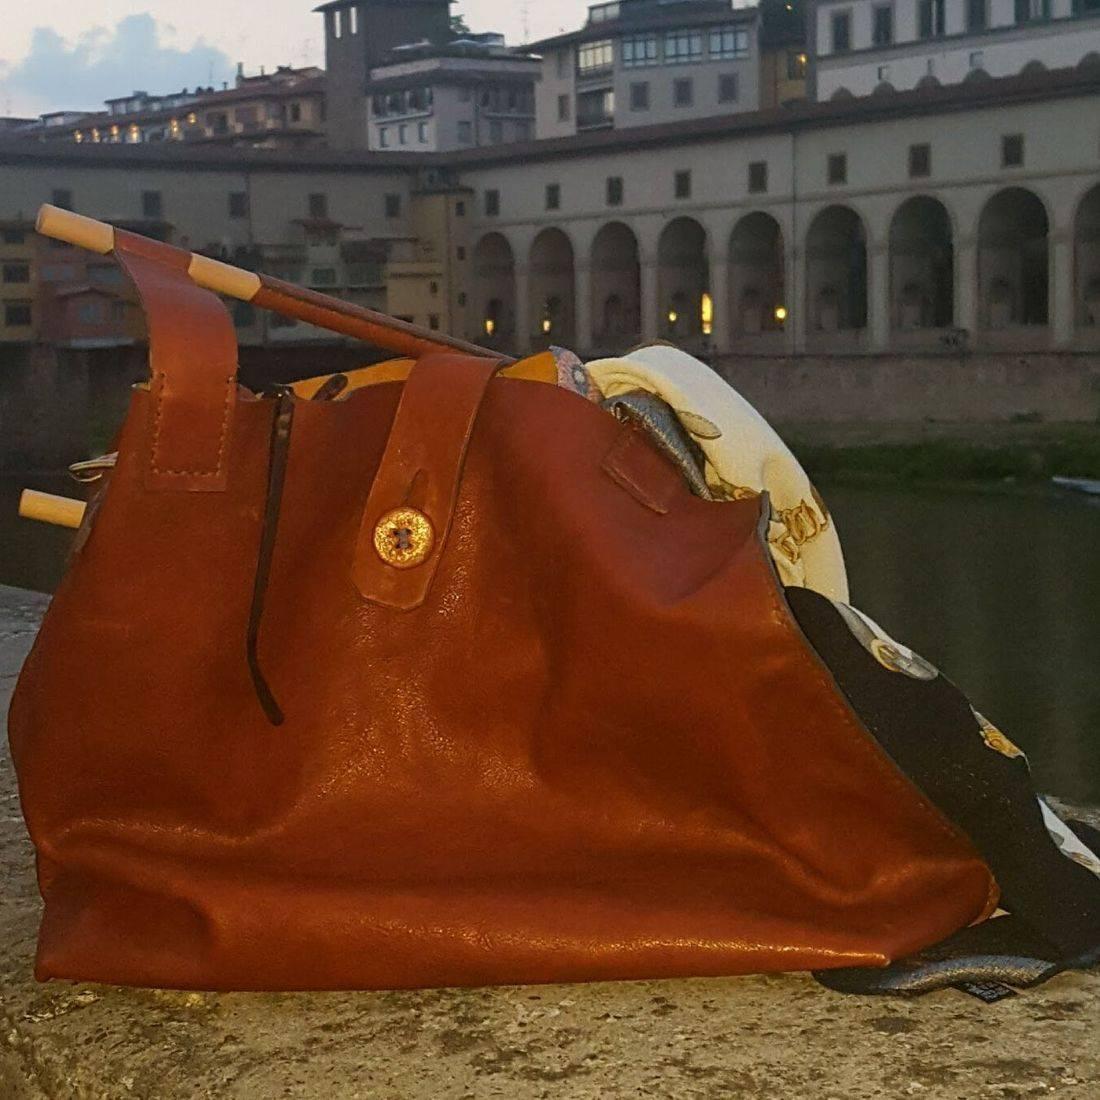 leather bag, florentine artisan, custom leather bag, bespoke, custom made bags, leather bags from Florence